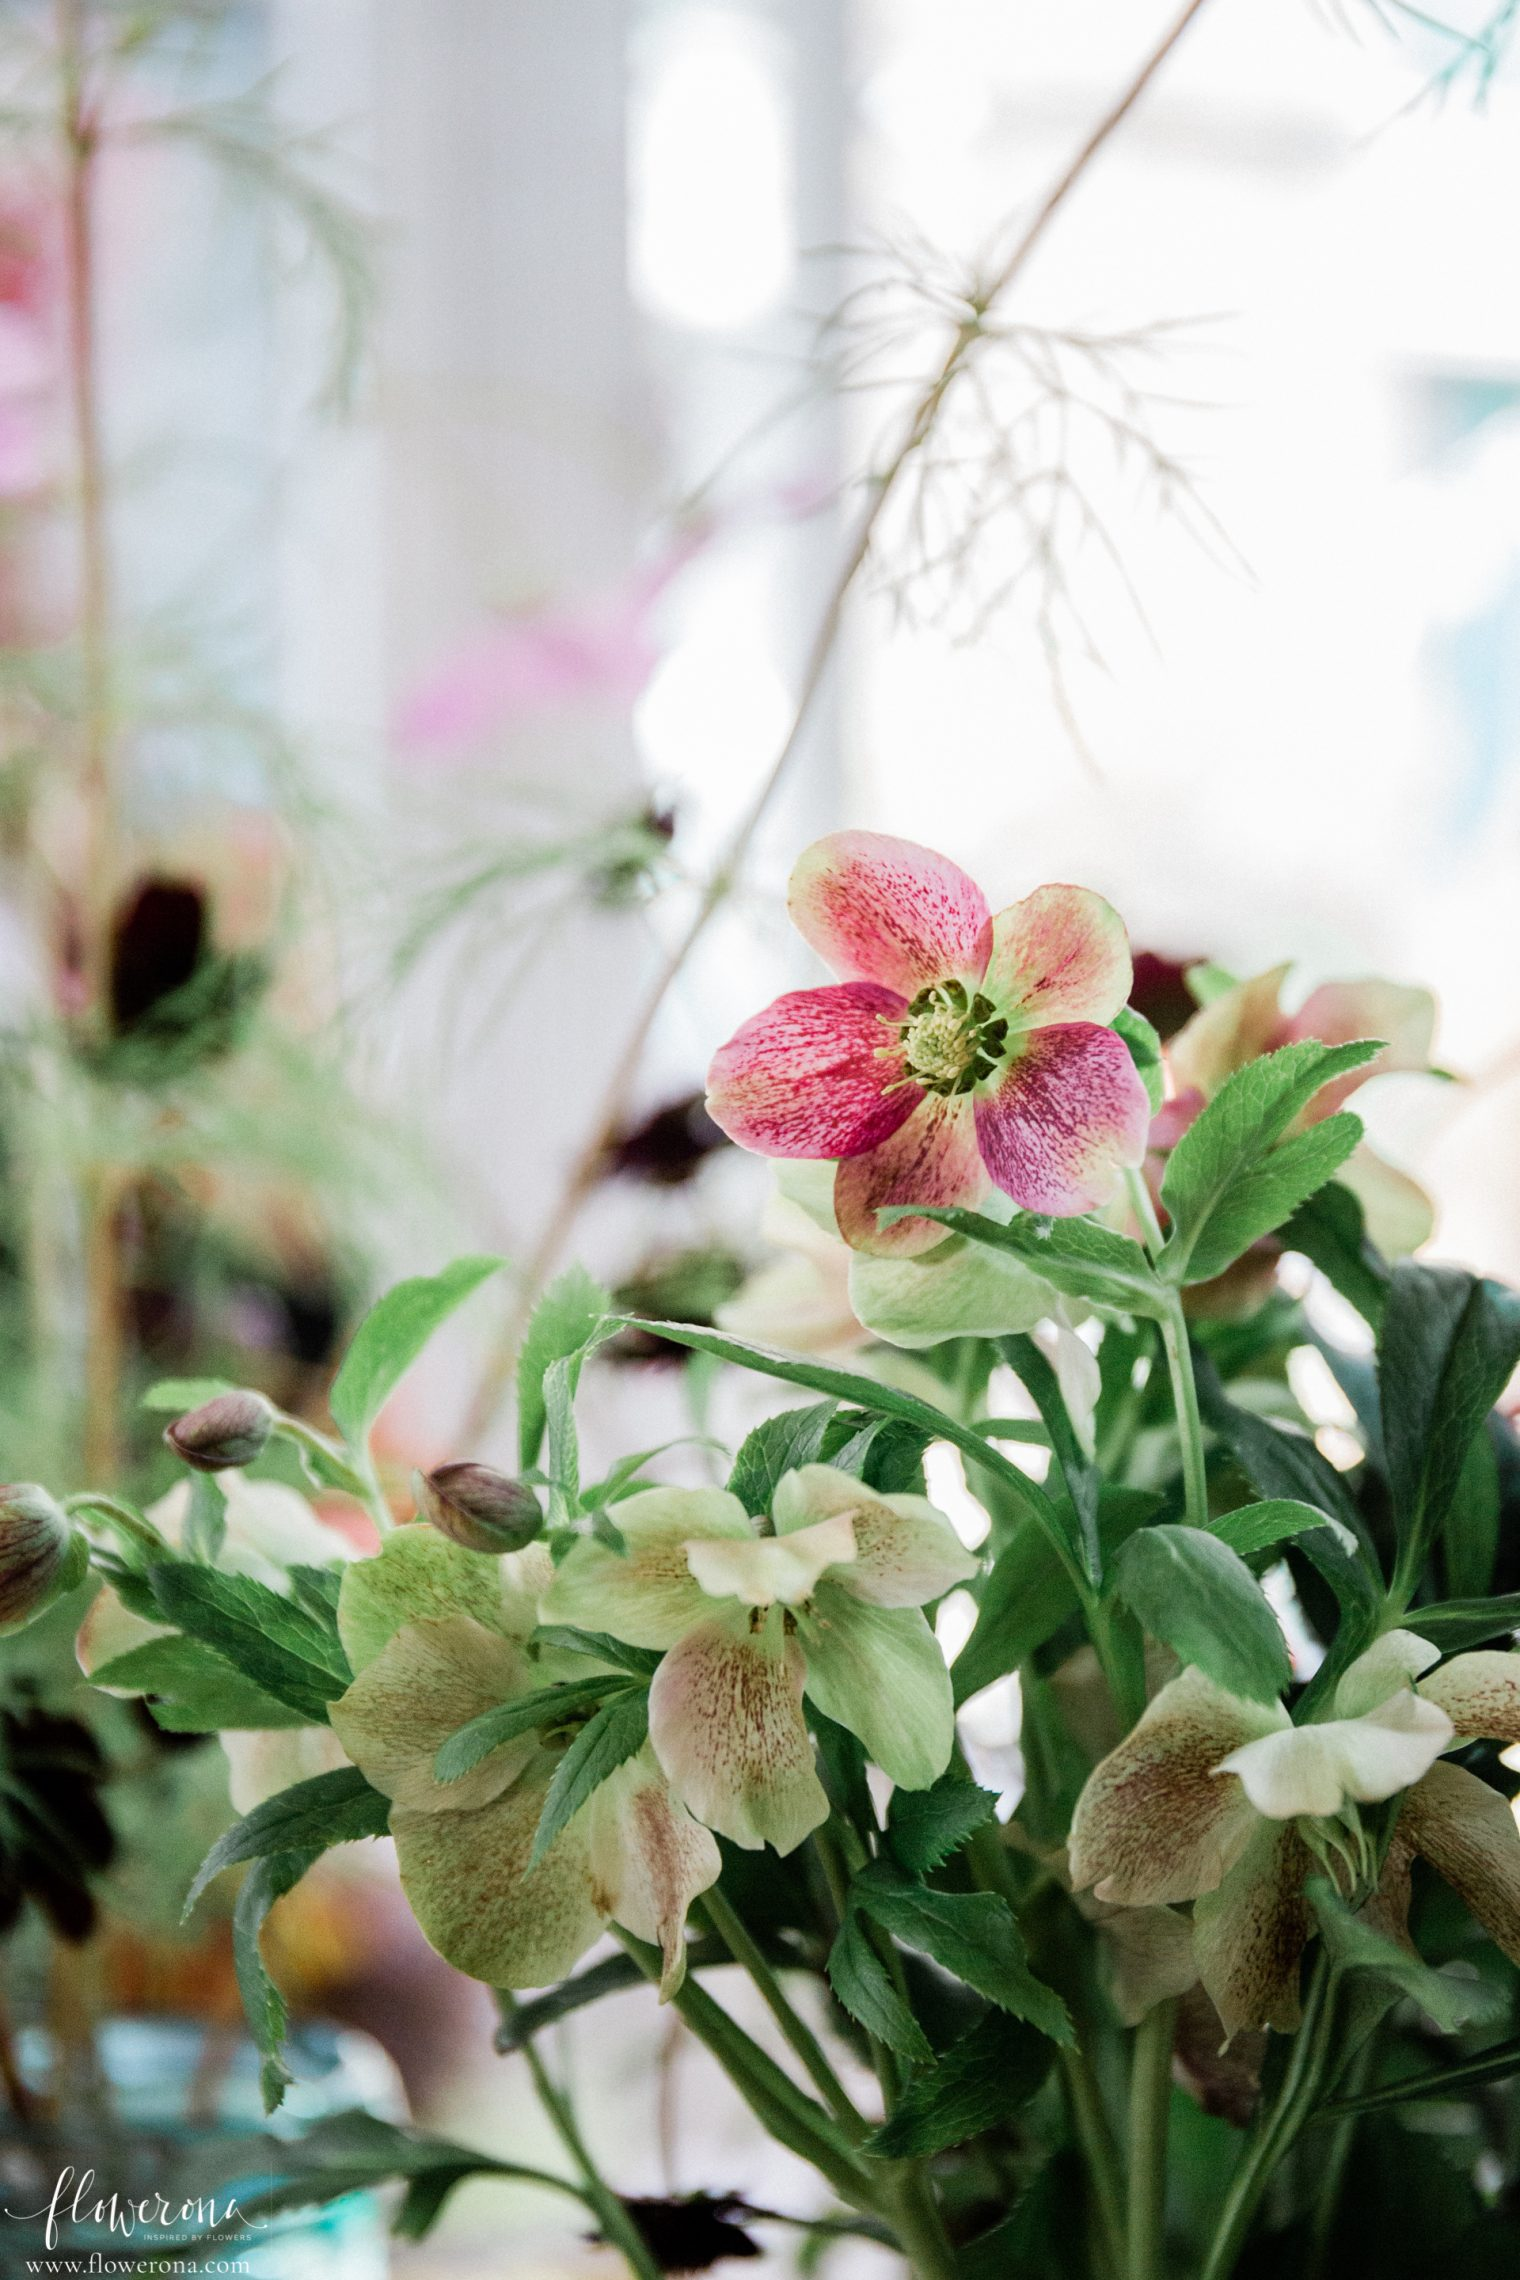 Hellebore plant